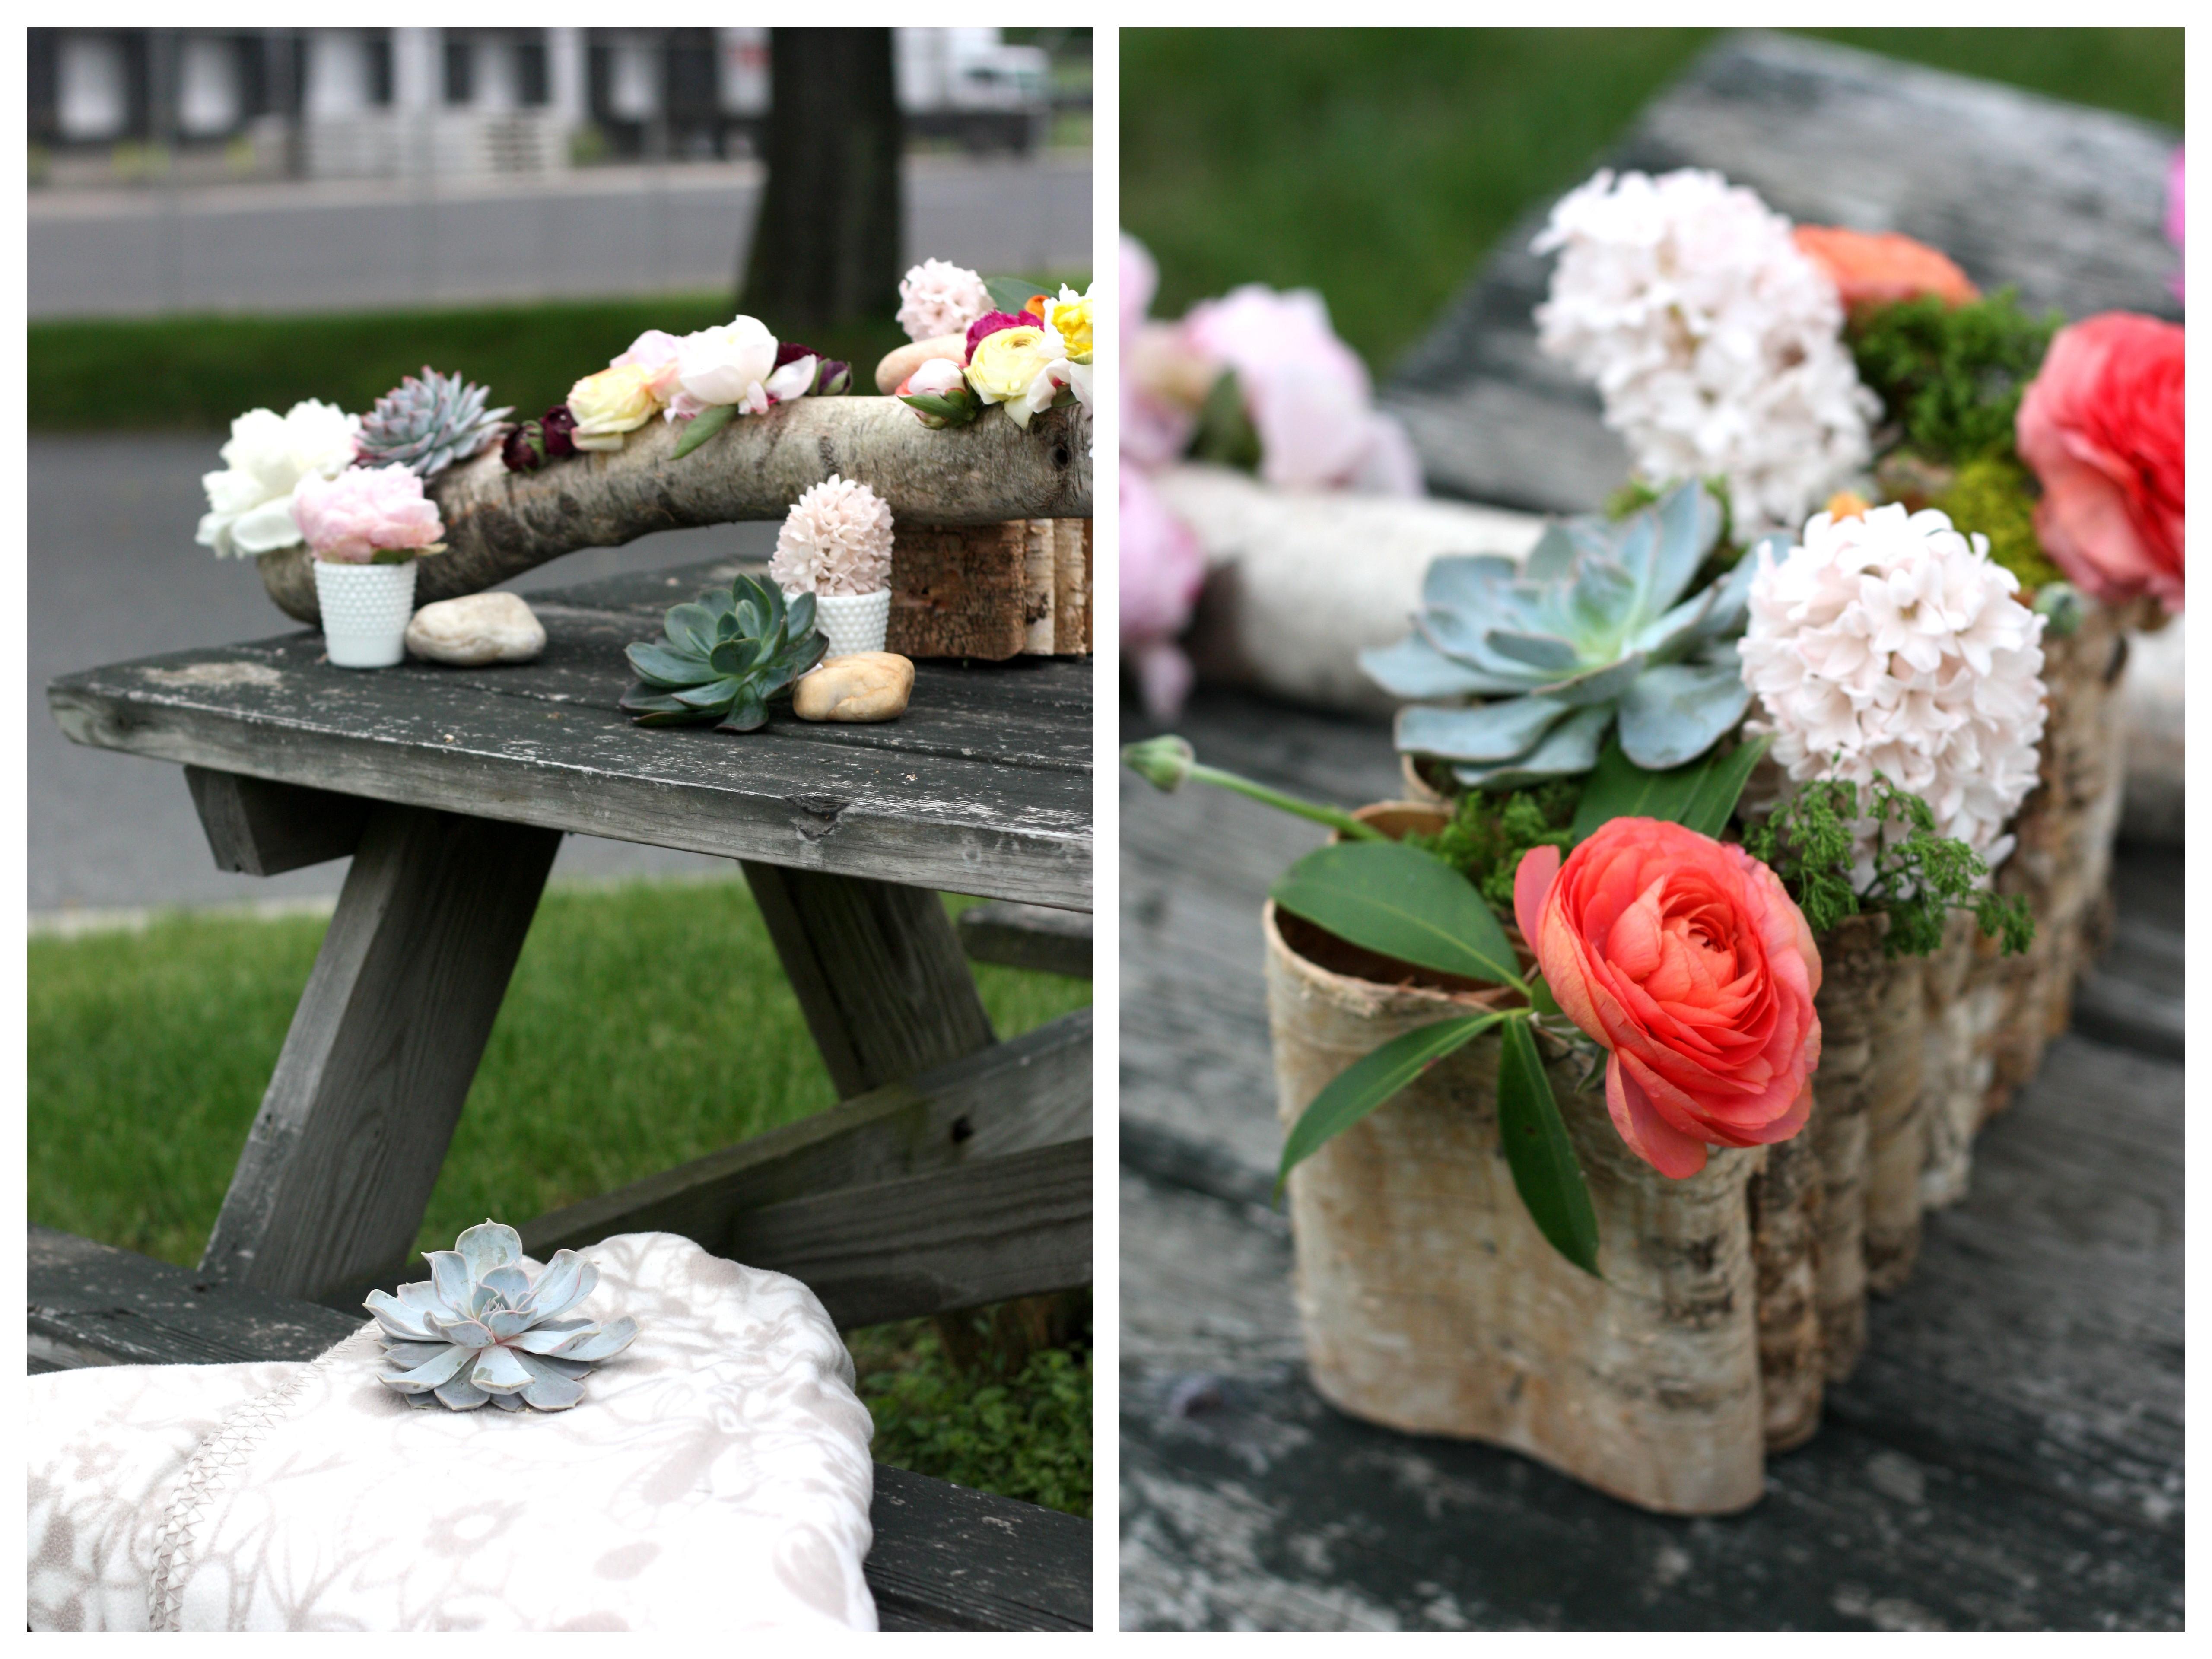 Wedding Flower Trends 2013